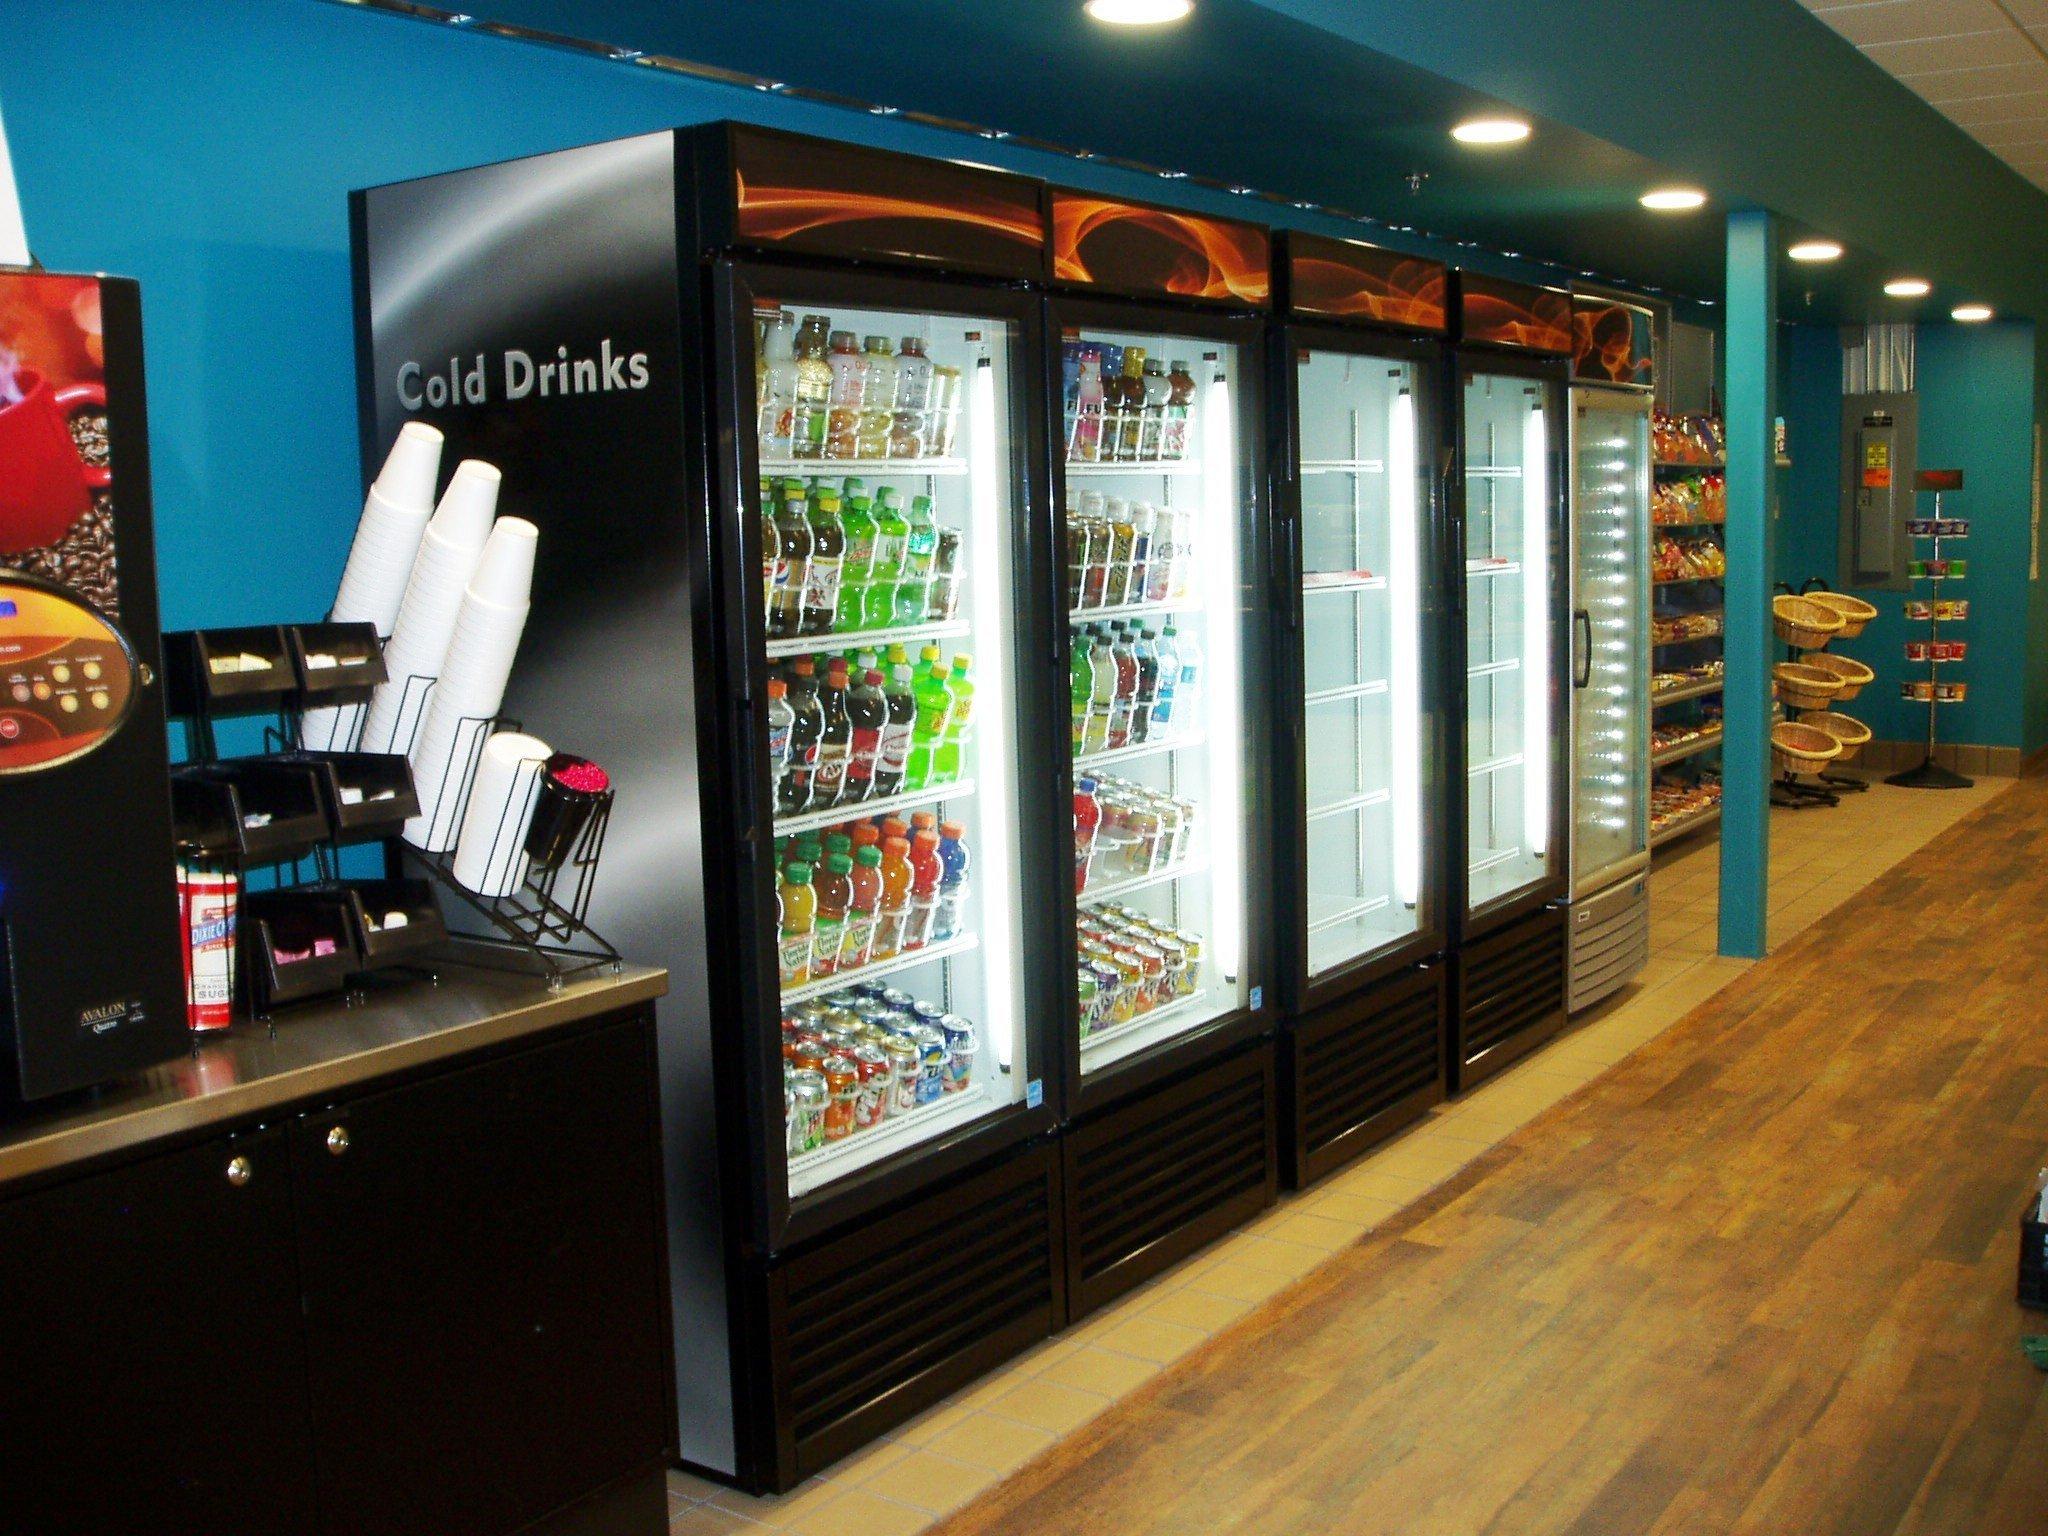 Coffee Supply & Vending Machines, Burlington NC